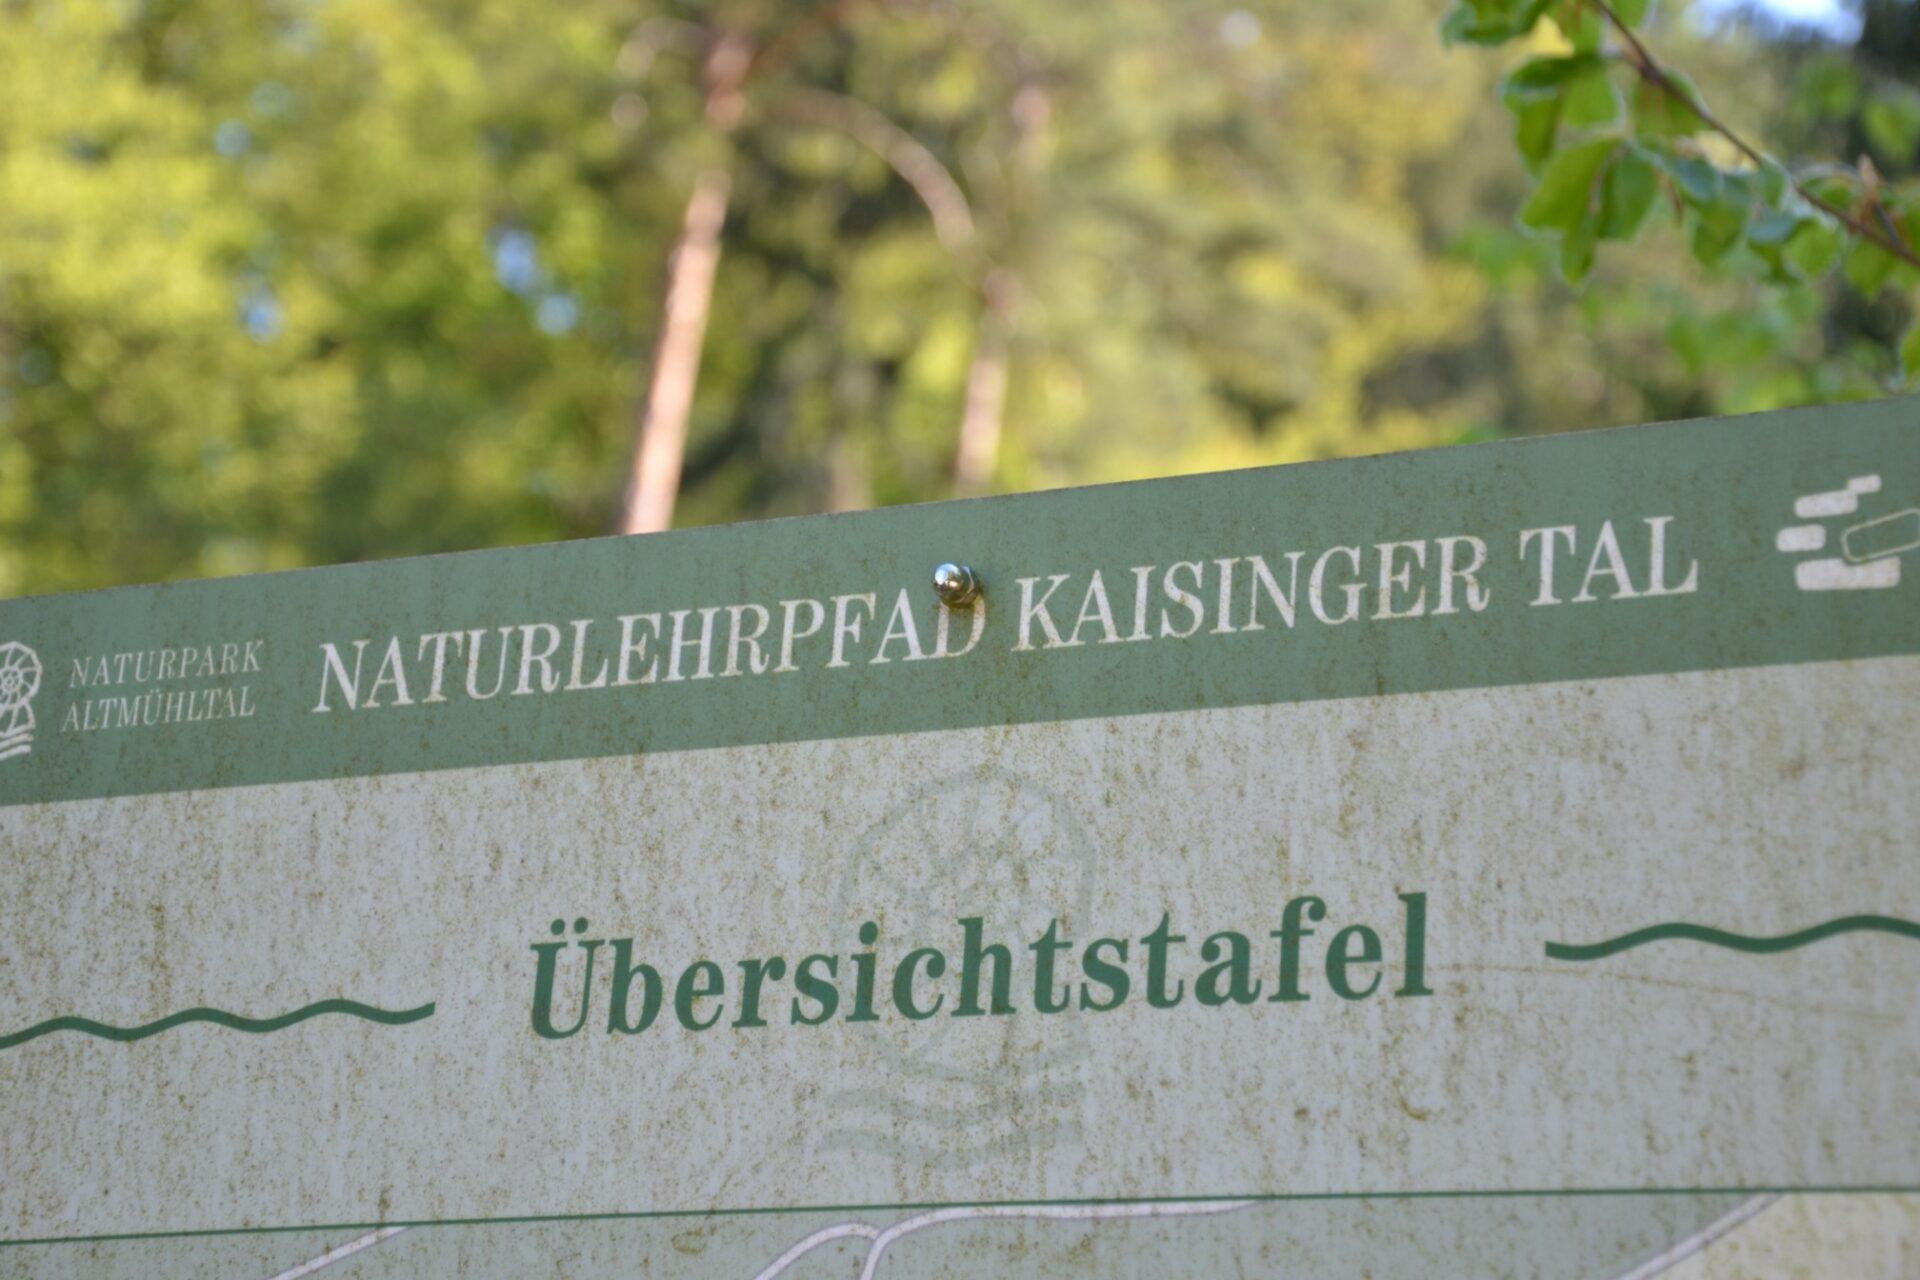 Auf dem Naturlehrpfad Kaisinger Tal